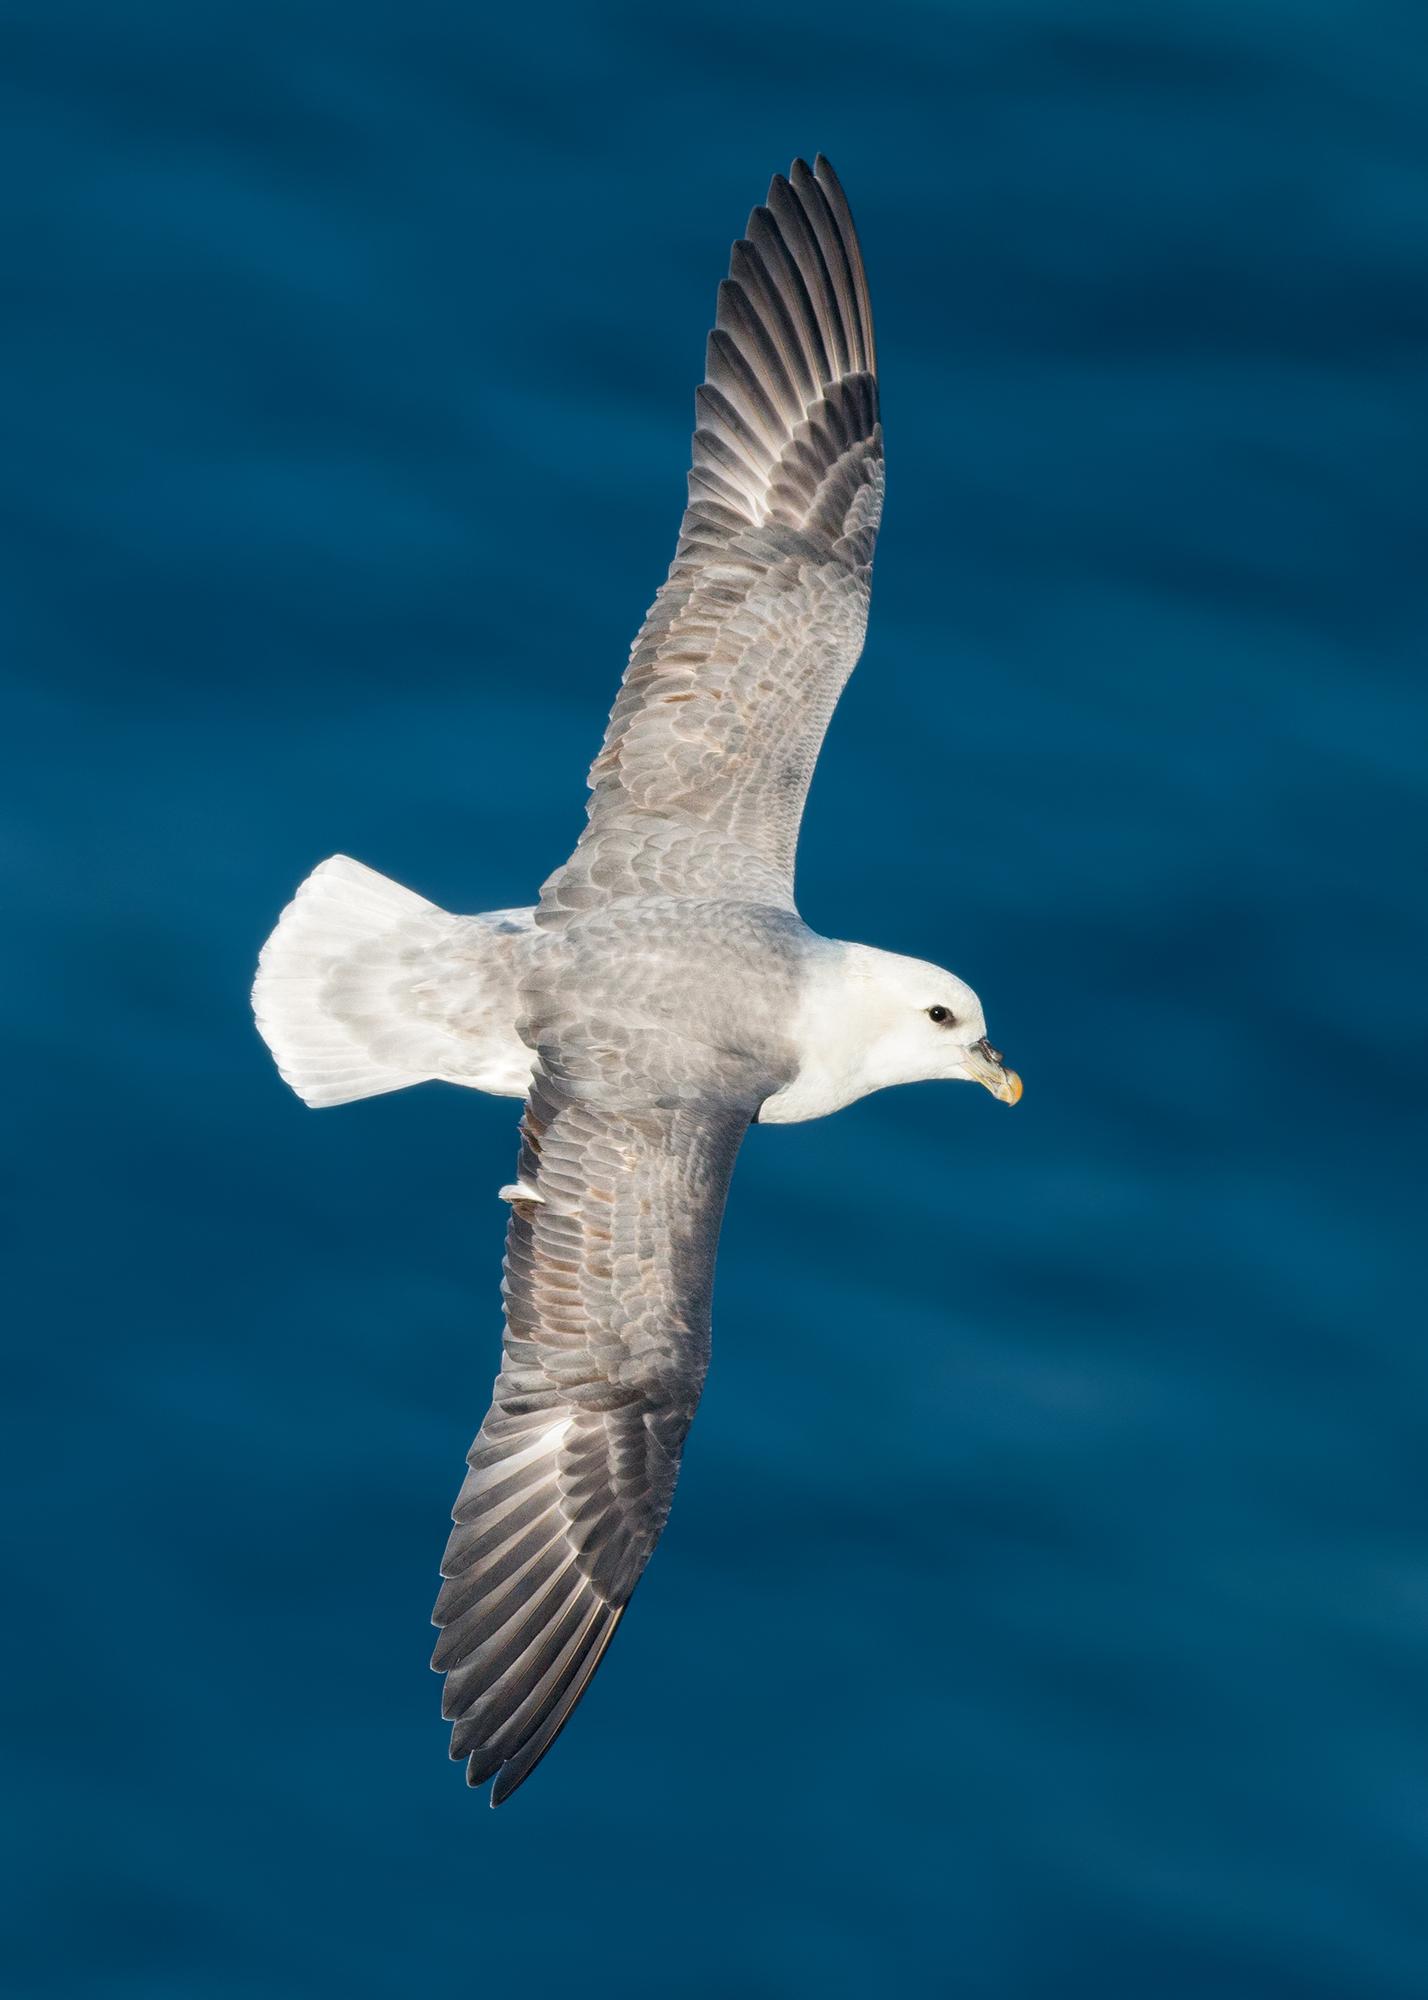 Stormfågel-JPEG_web 14.jpg